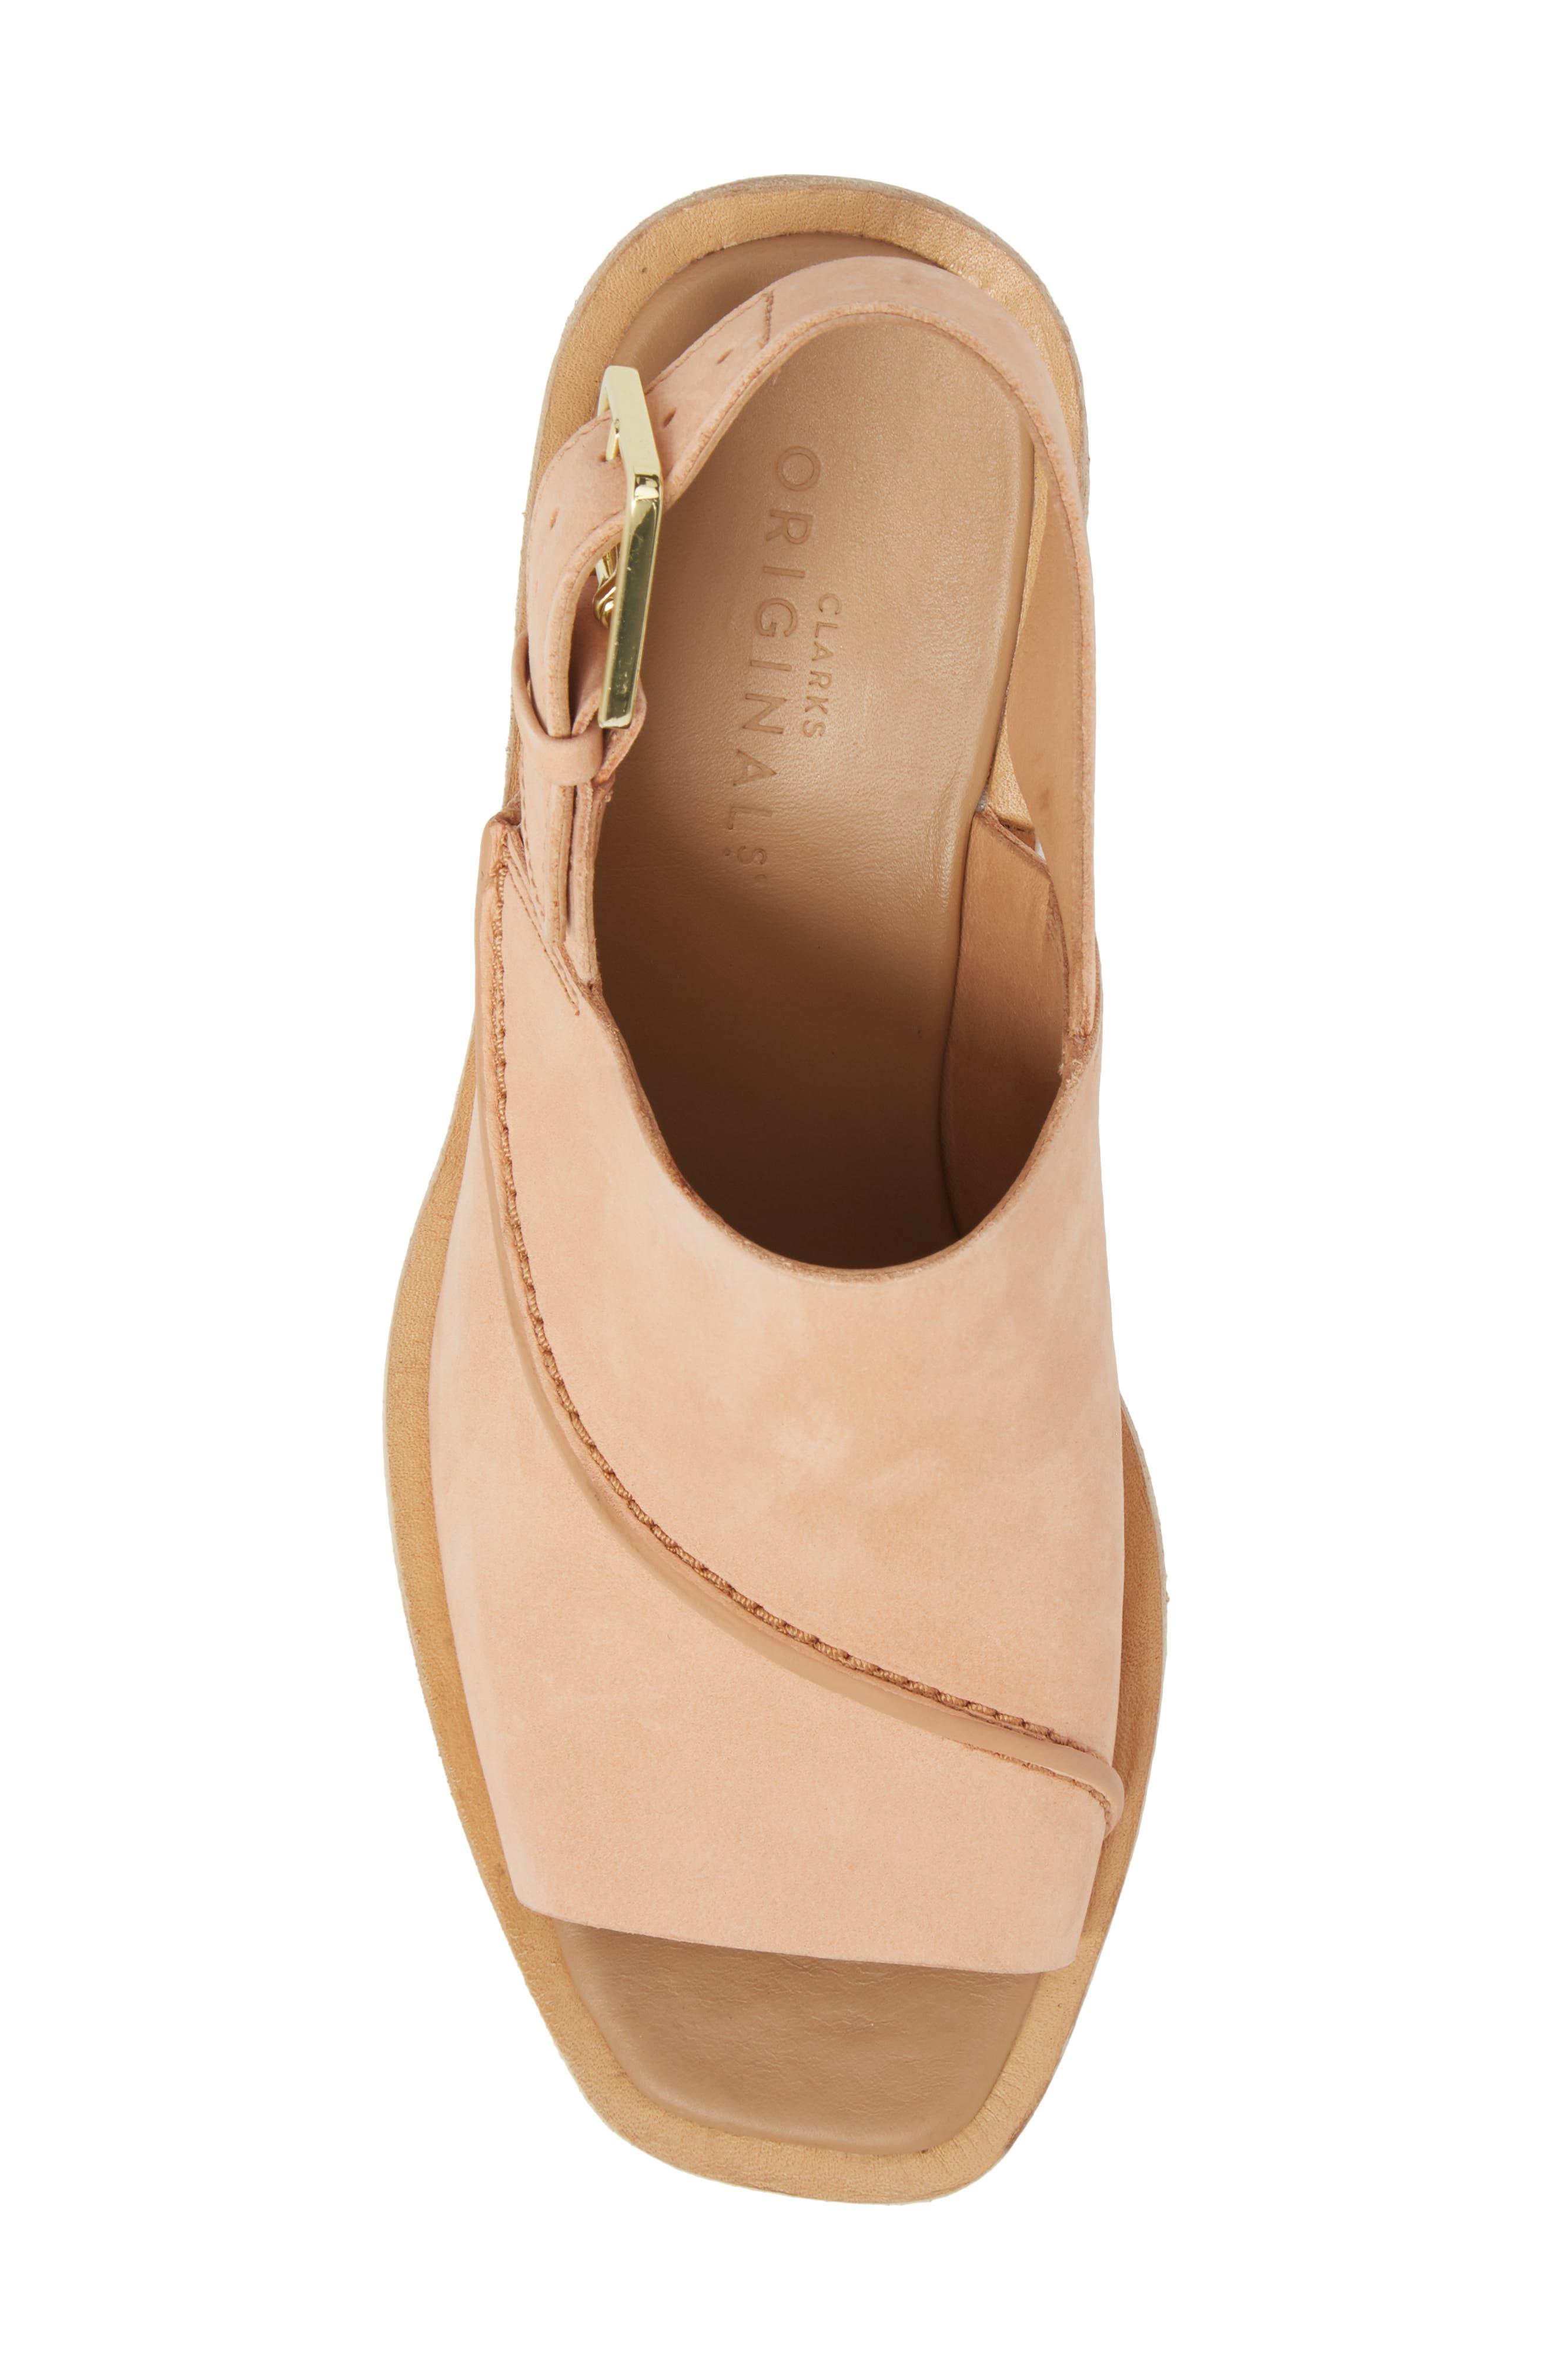 Clarks Bermudan Block Heel Sandal,                             Alternate thumbnail 5, color,                             Sandstone Nubuck Leather